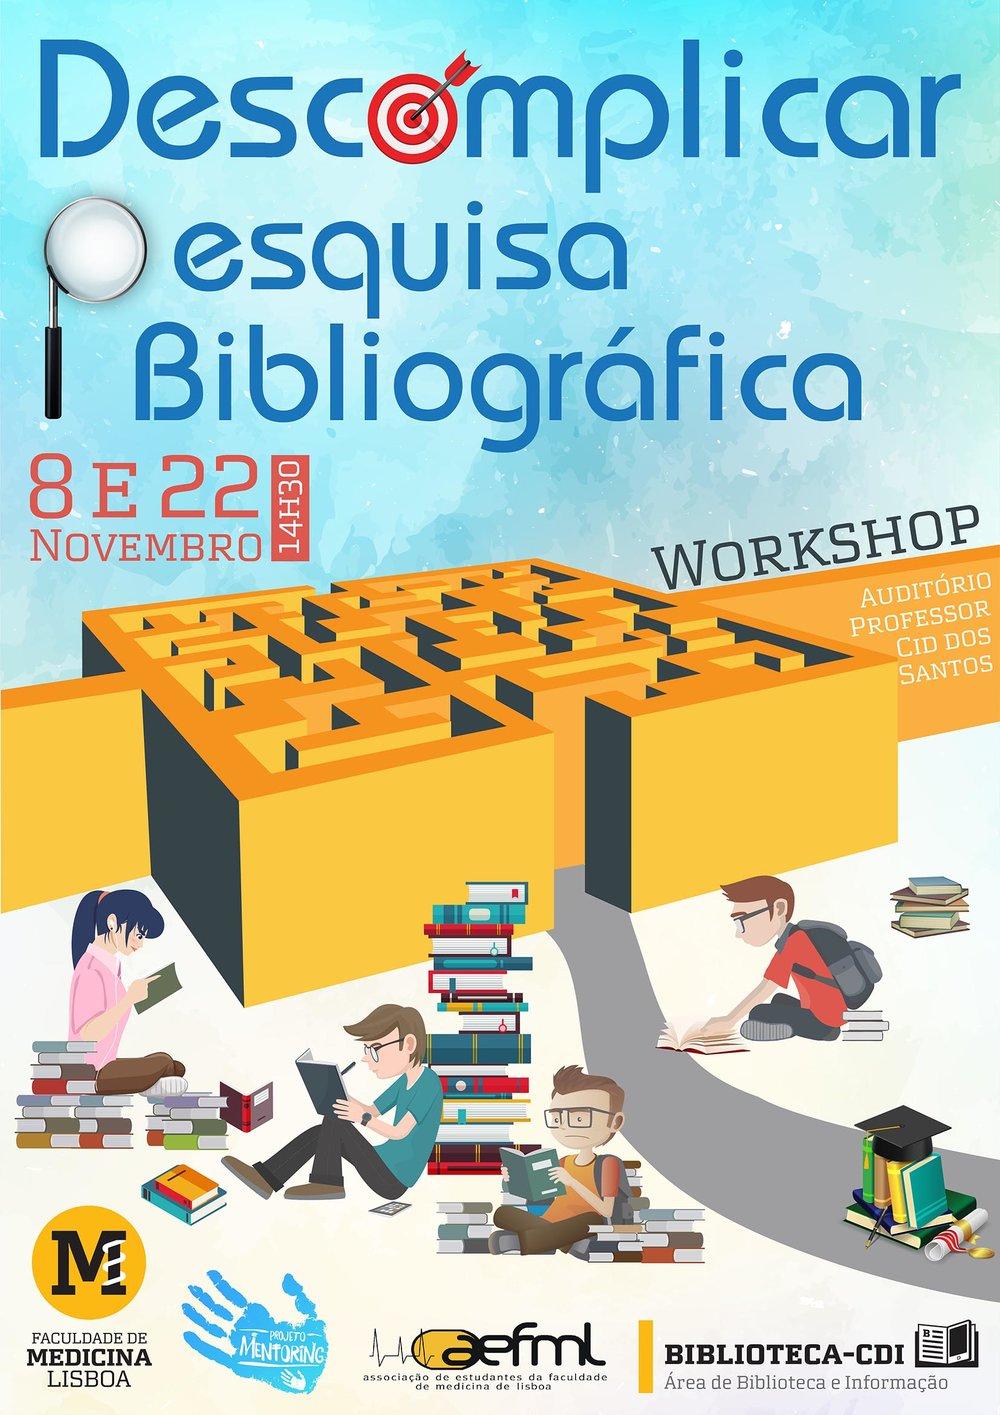 Descomplicar Pesquisa Bibliografica Mentoring 2018 versao website-2.jpg